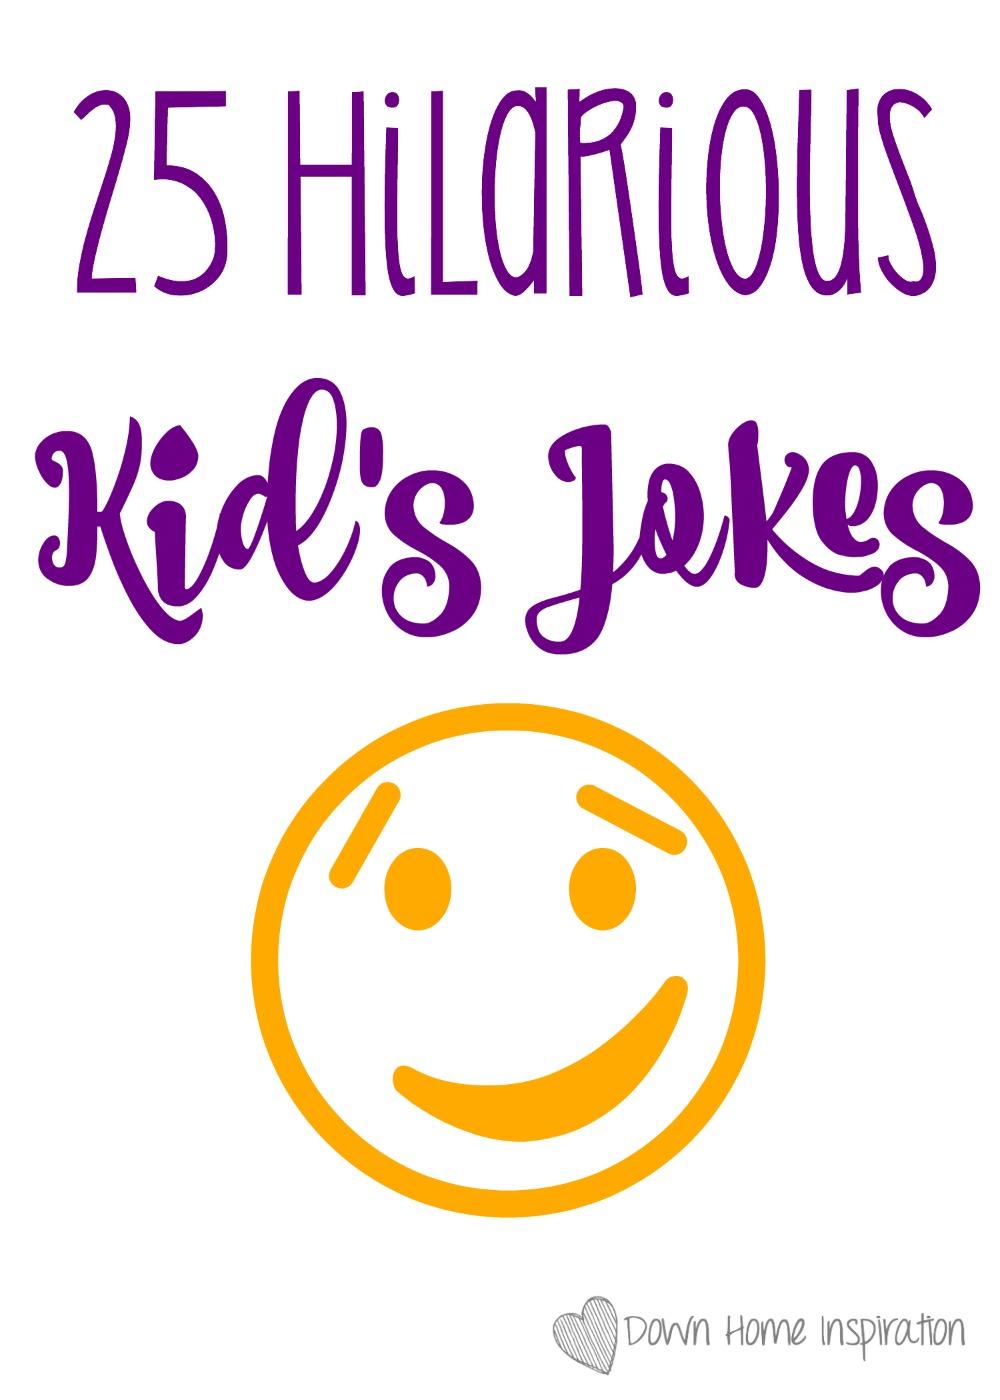 jokes hilarious kid funny down joke toddler silly inspiration cute children humor conversation starters riddles downhomeinspiration fun think christmas